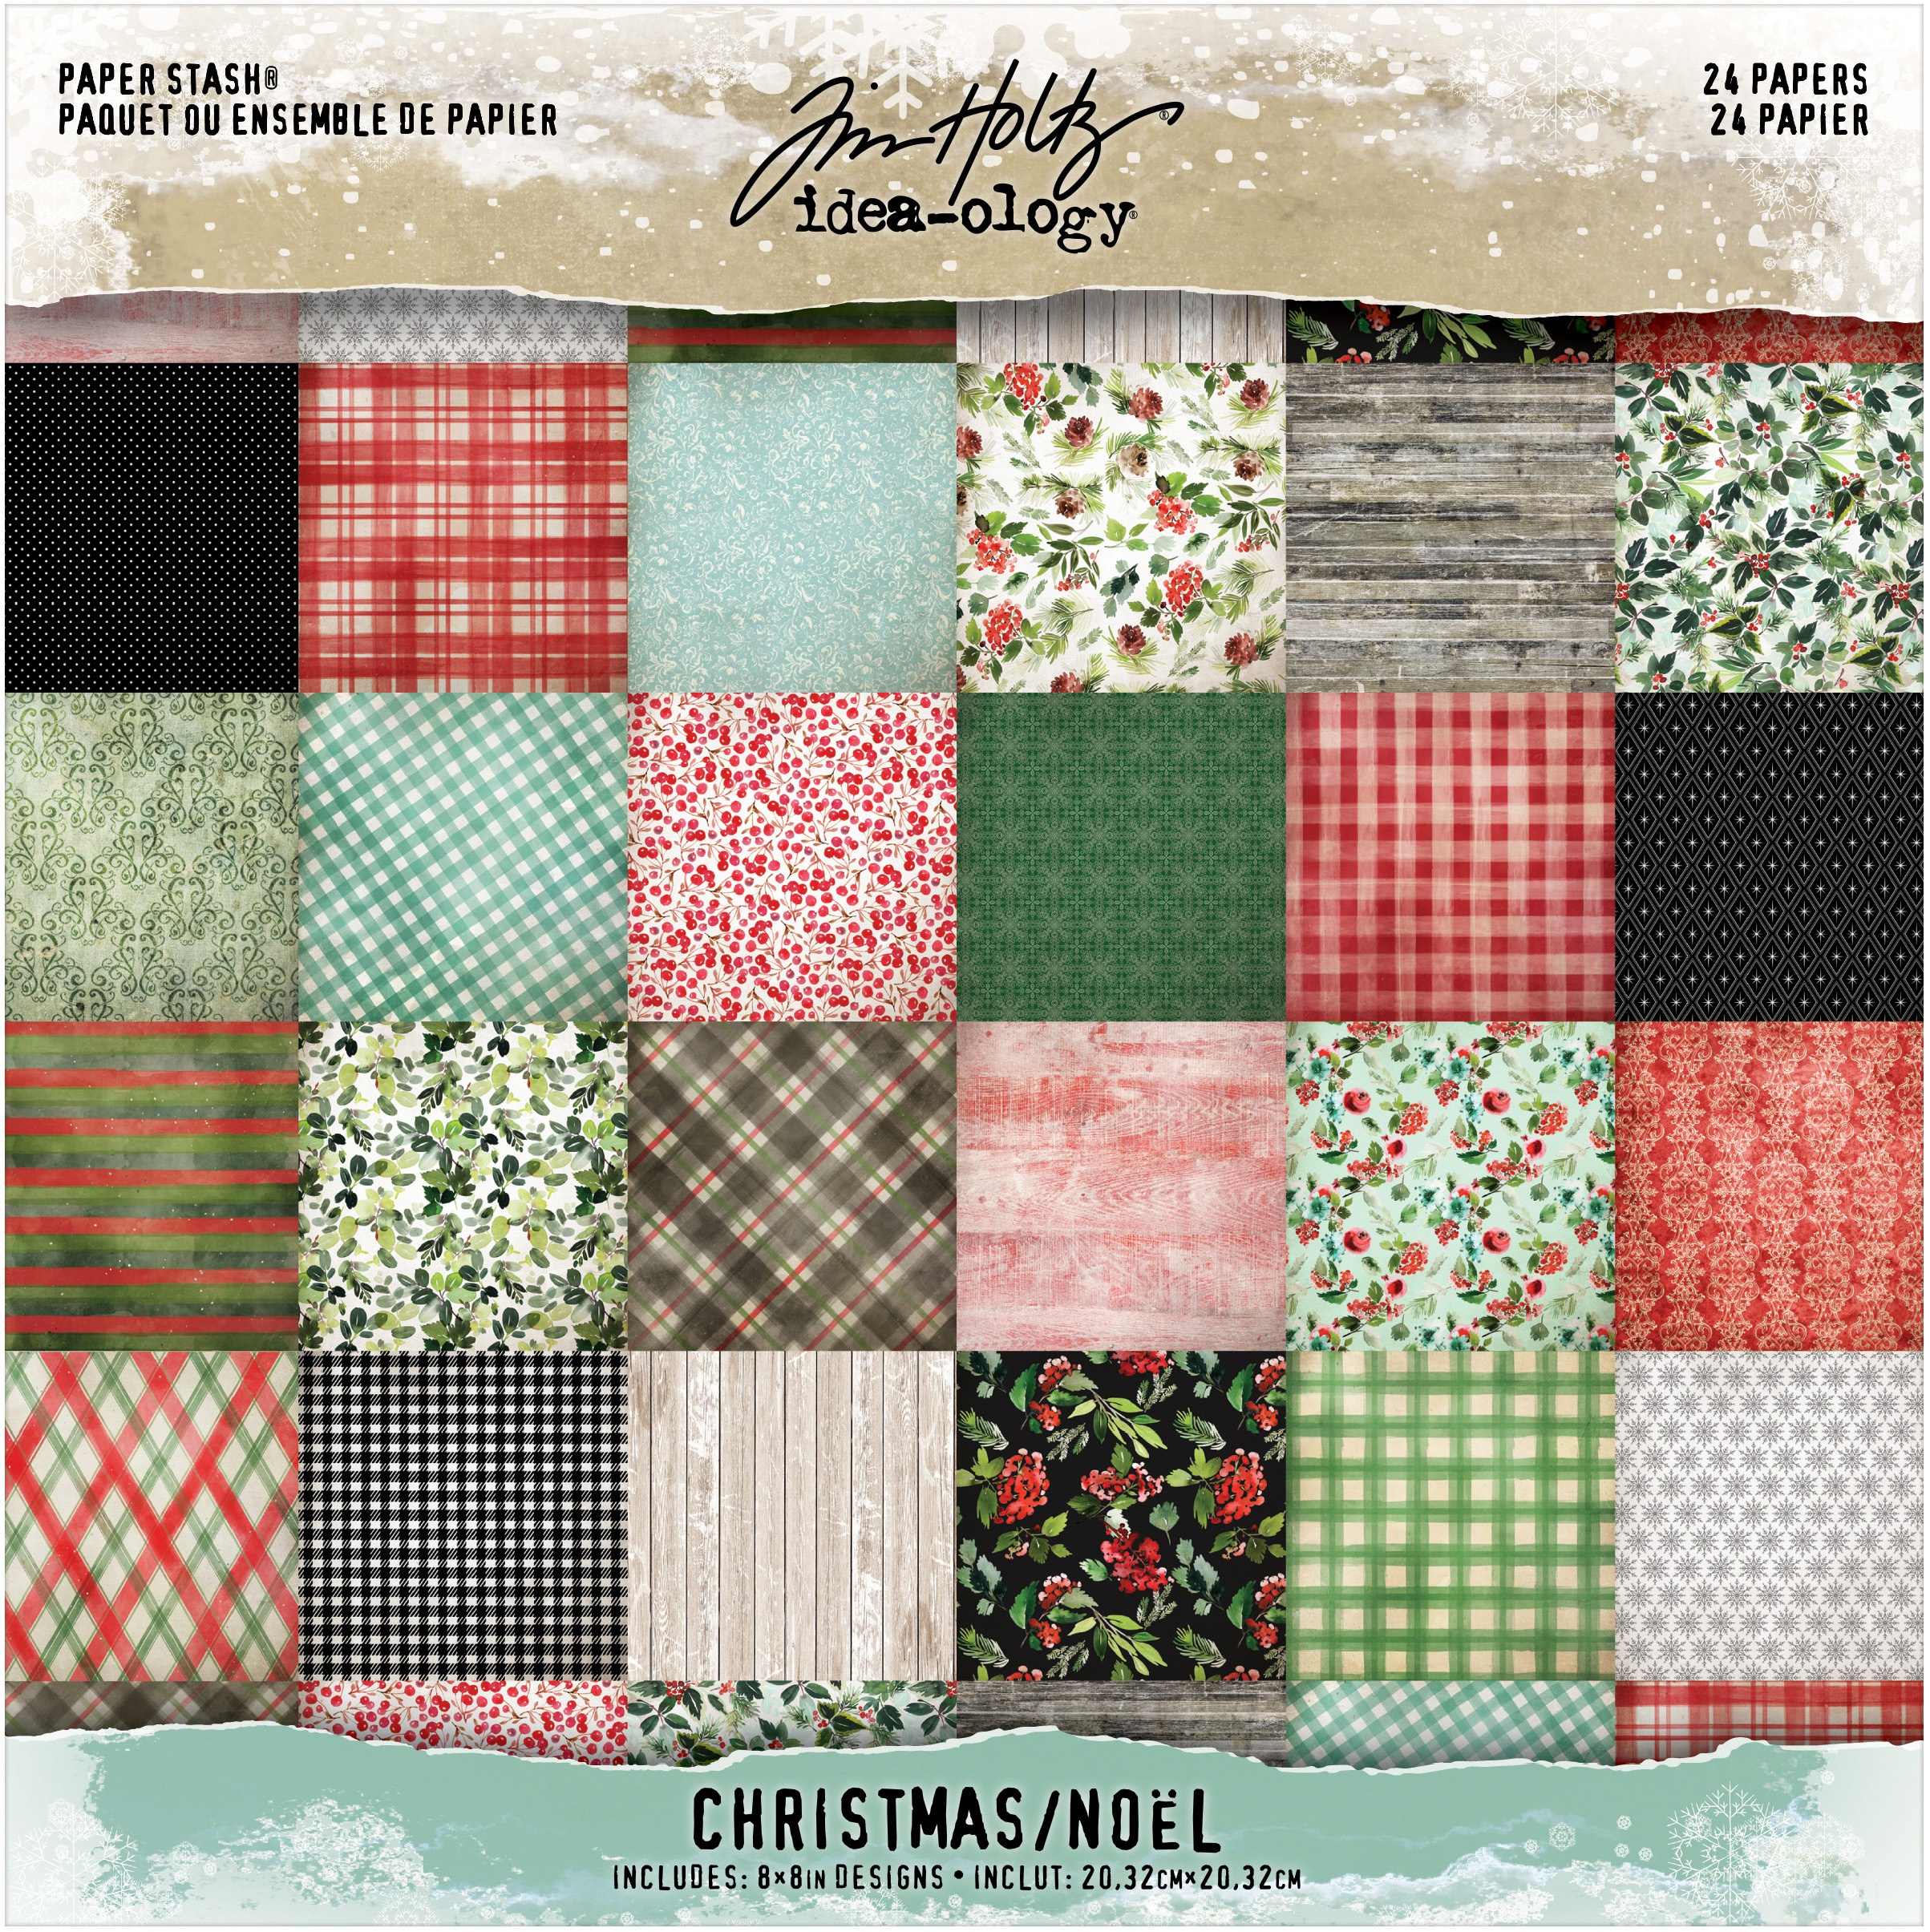 Tim Holtz Idea-Ology Paper Stash Double-Sided Paper Pad 8X8 24/Pkg-Christmas 12 Designs...